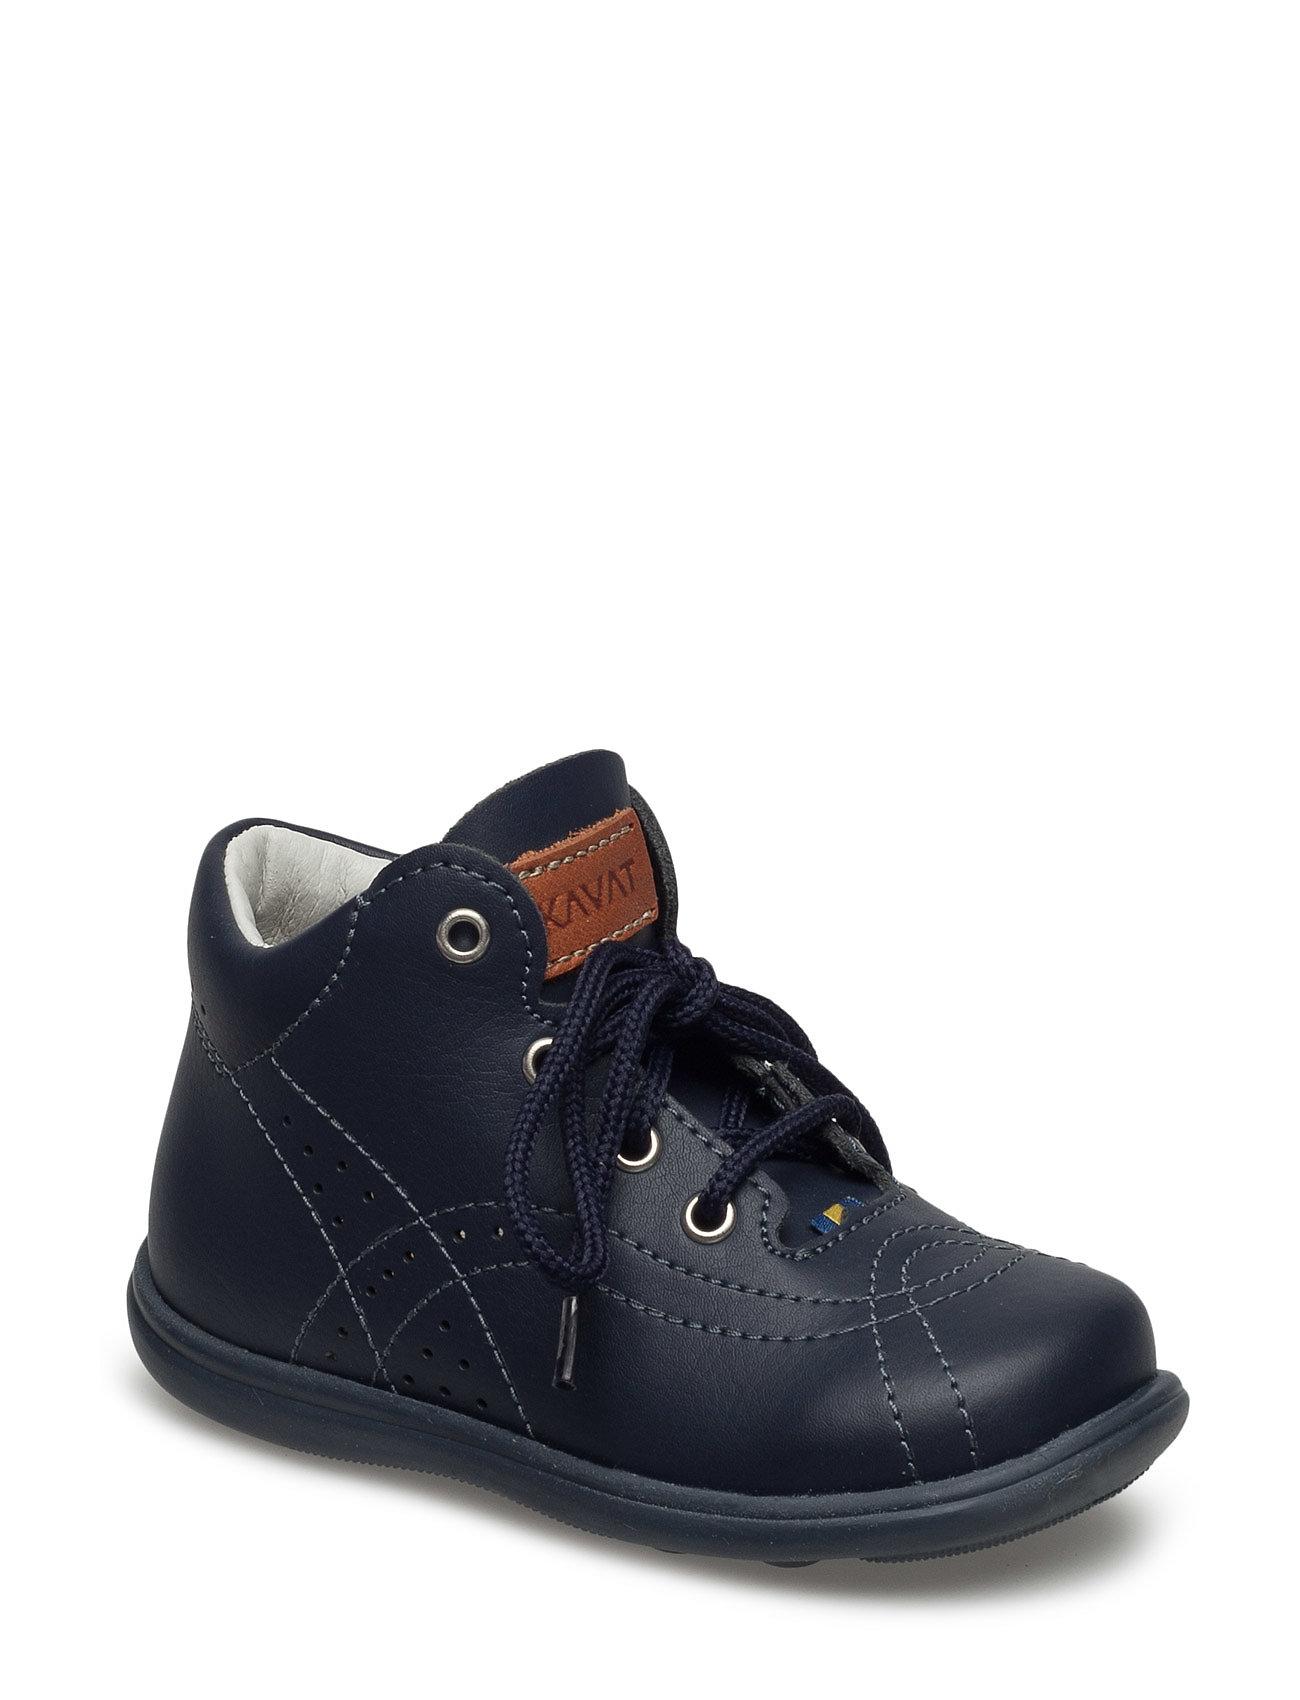 Edsbro Xc Shoe Kavat Sko & Sneakers til Børn i